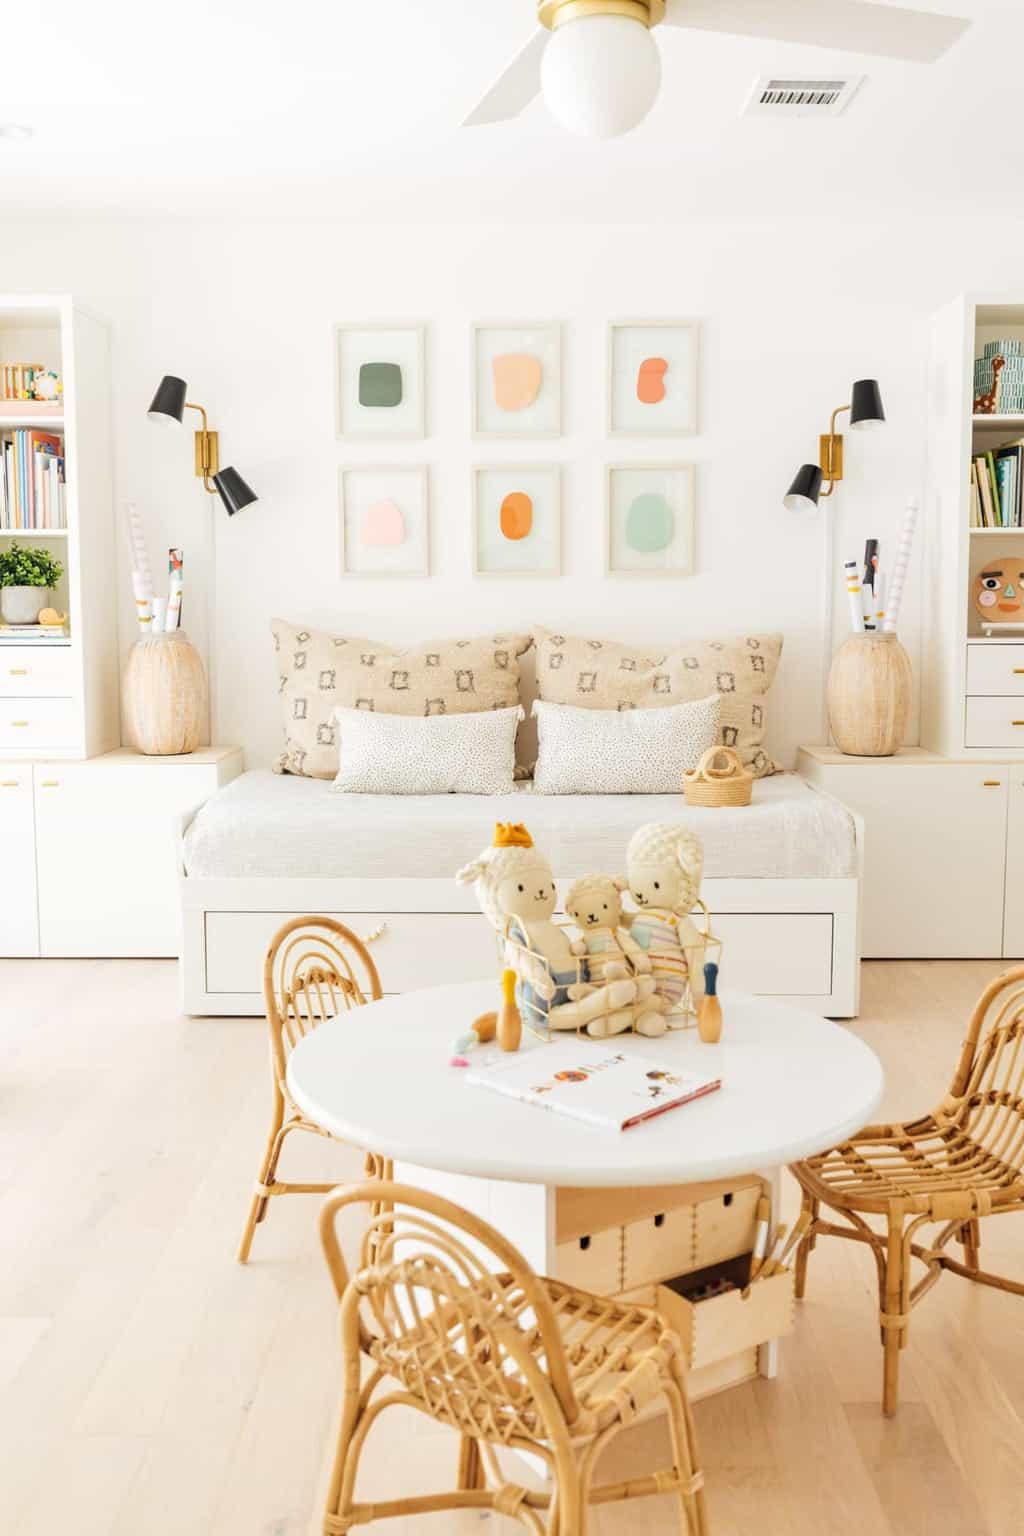 a DIY budget friendly kids playroom design idea